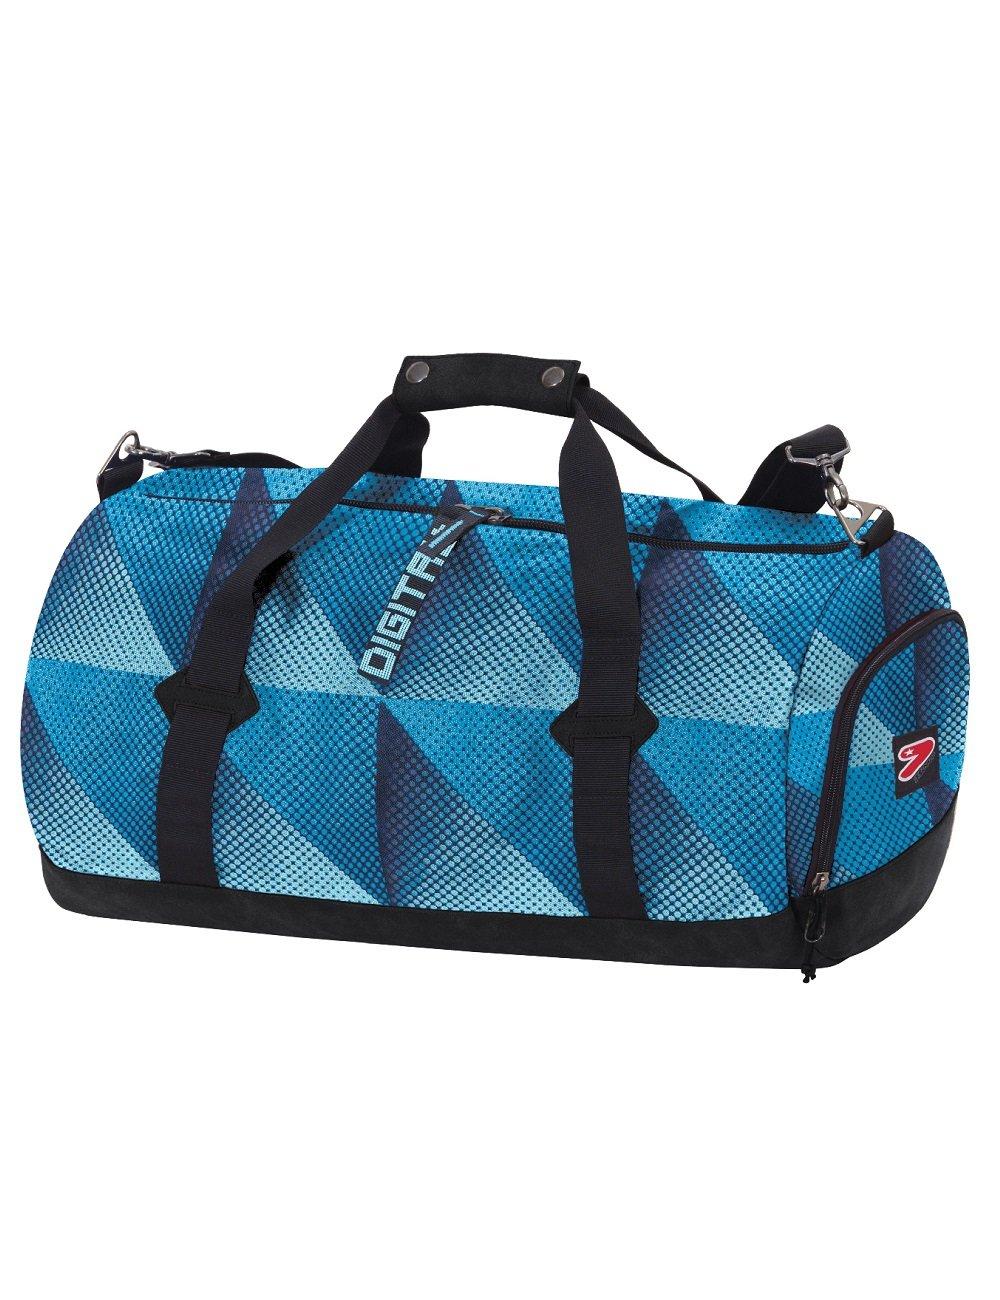 Sporttasche Seven The Double – FreeTime Bag – Blau Schwarz – 37 lt